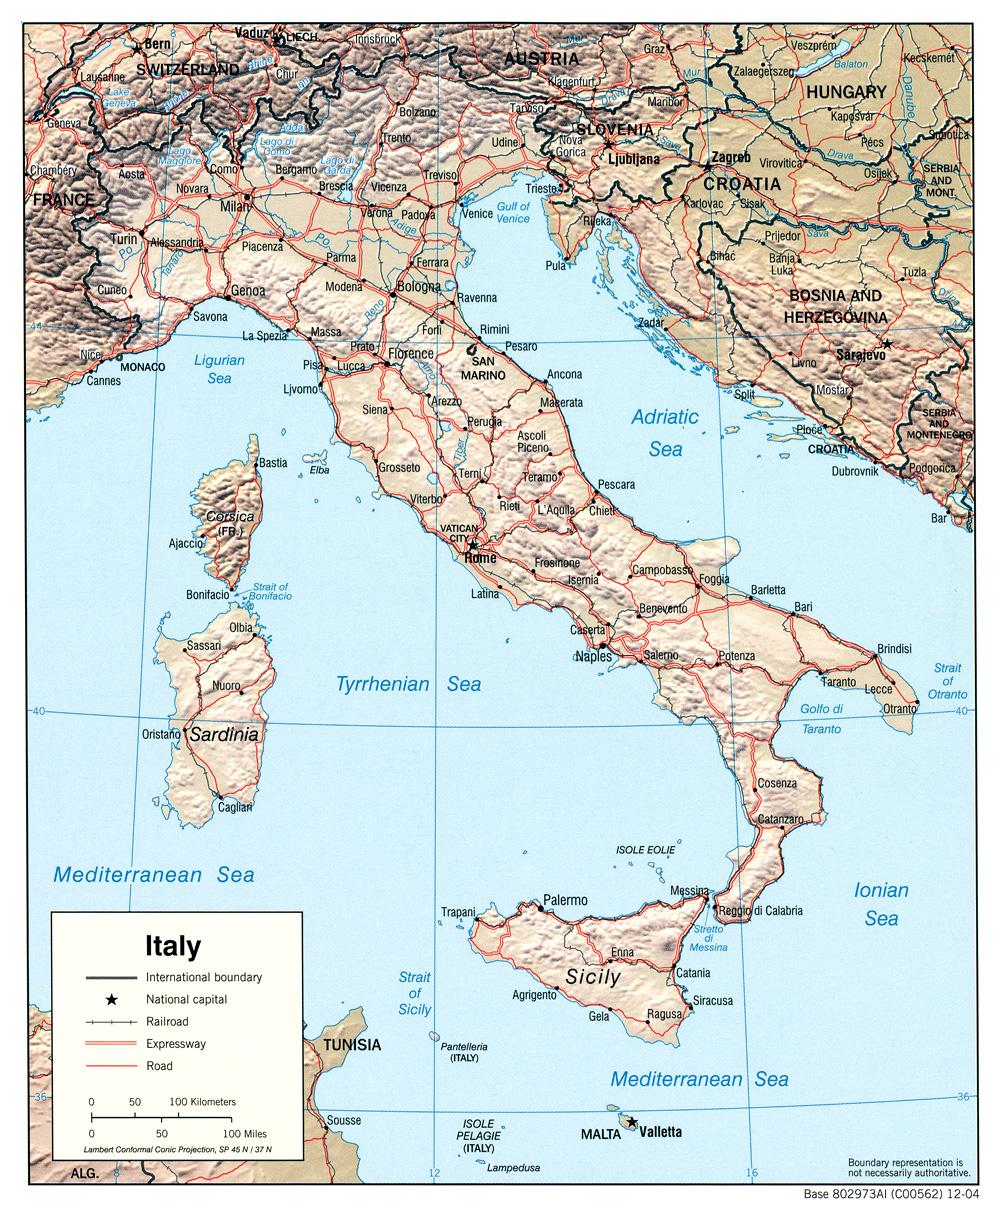 Mapa de Relieve Sombreado de Italia